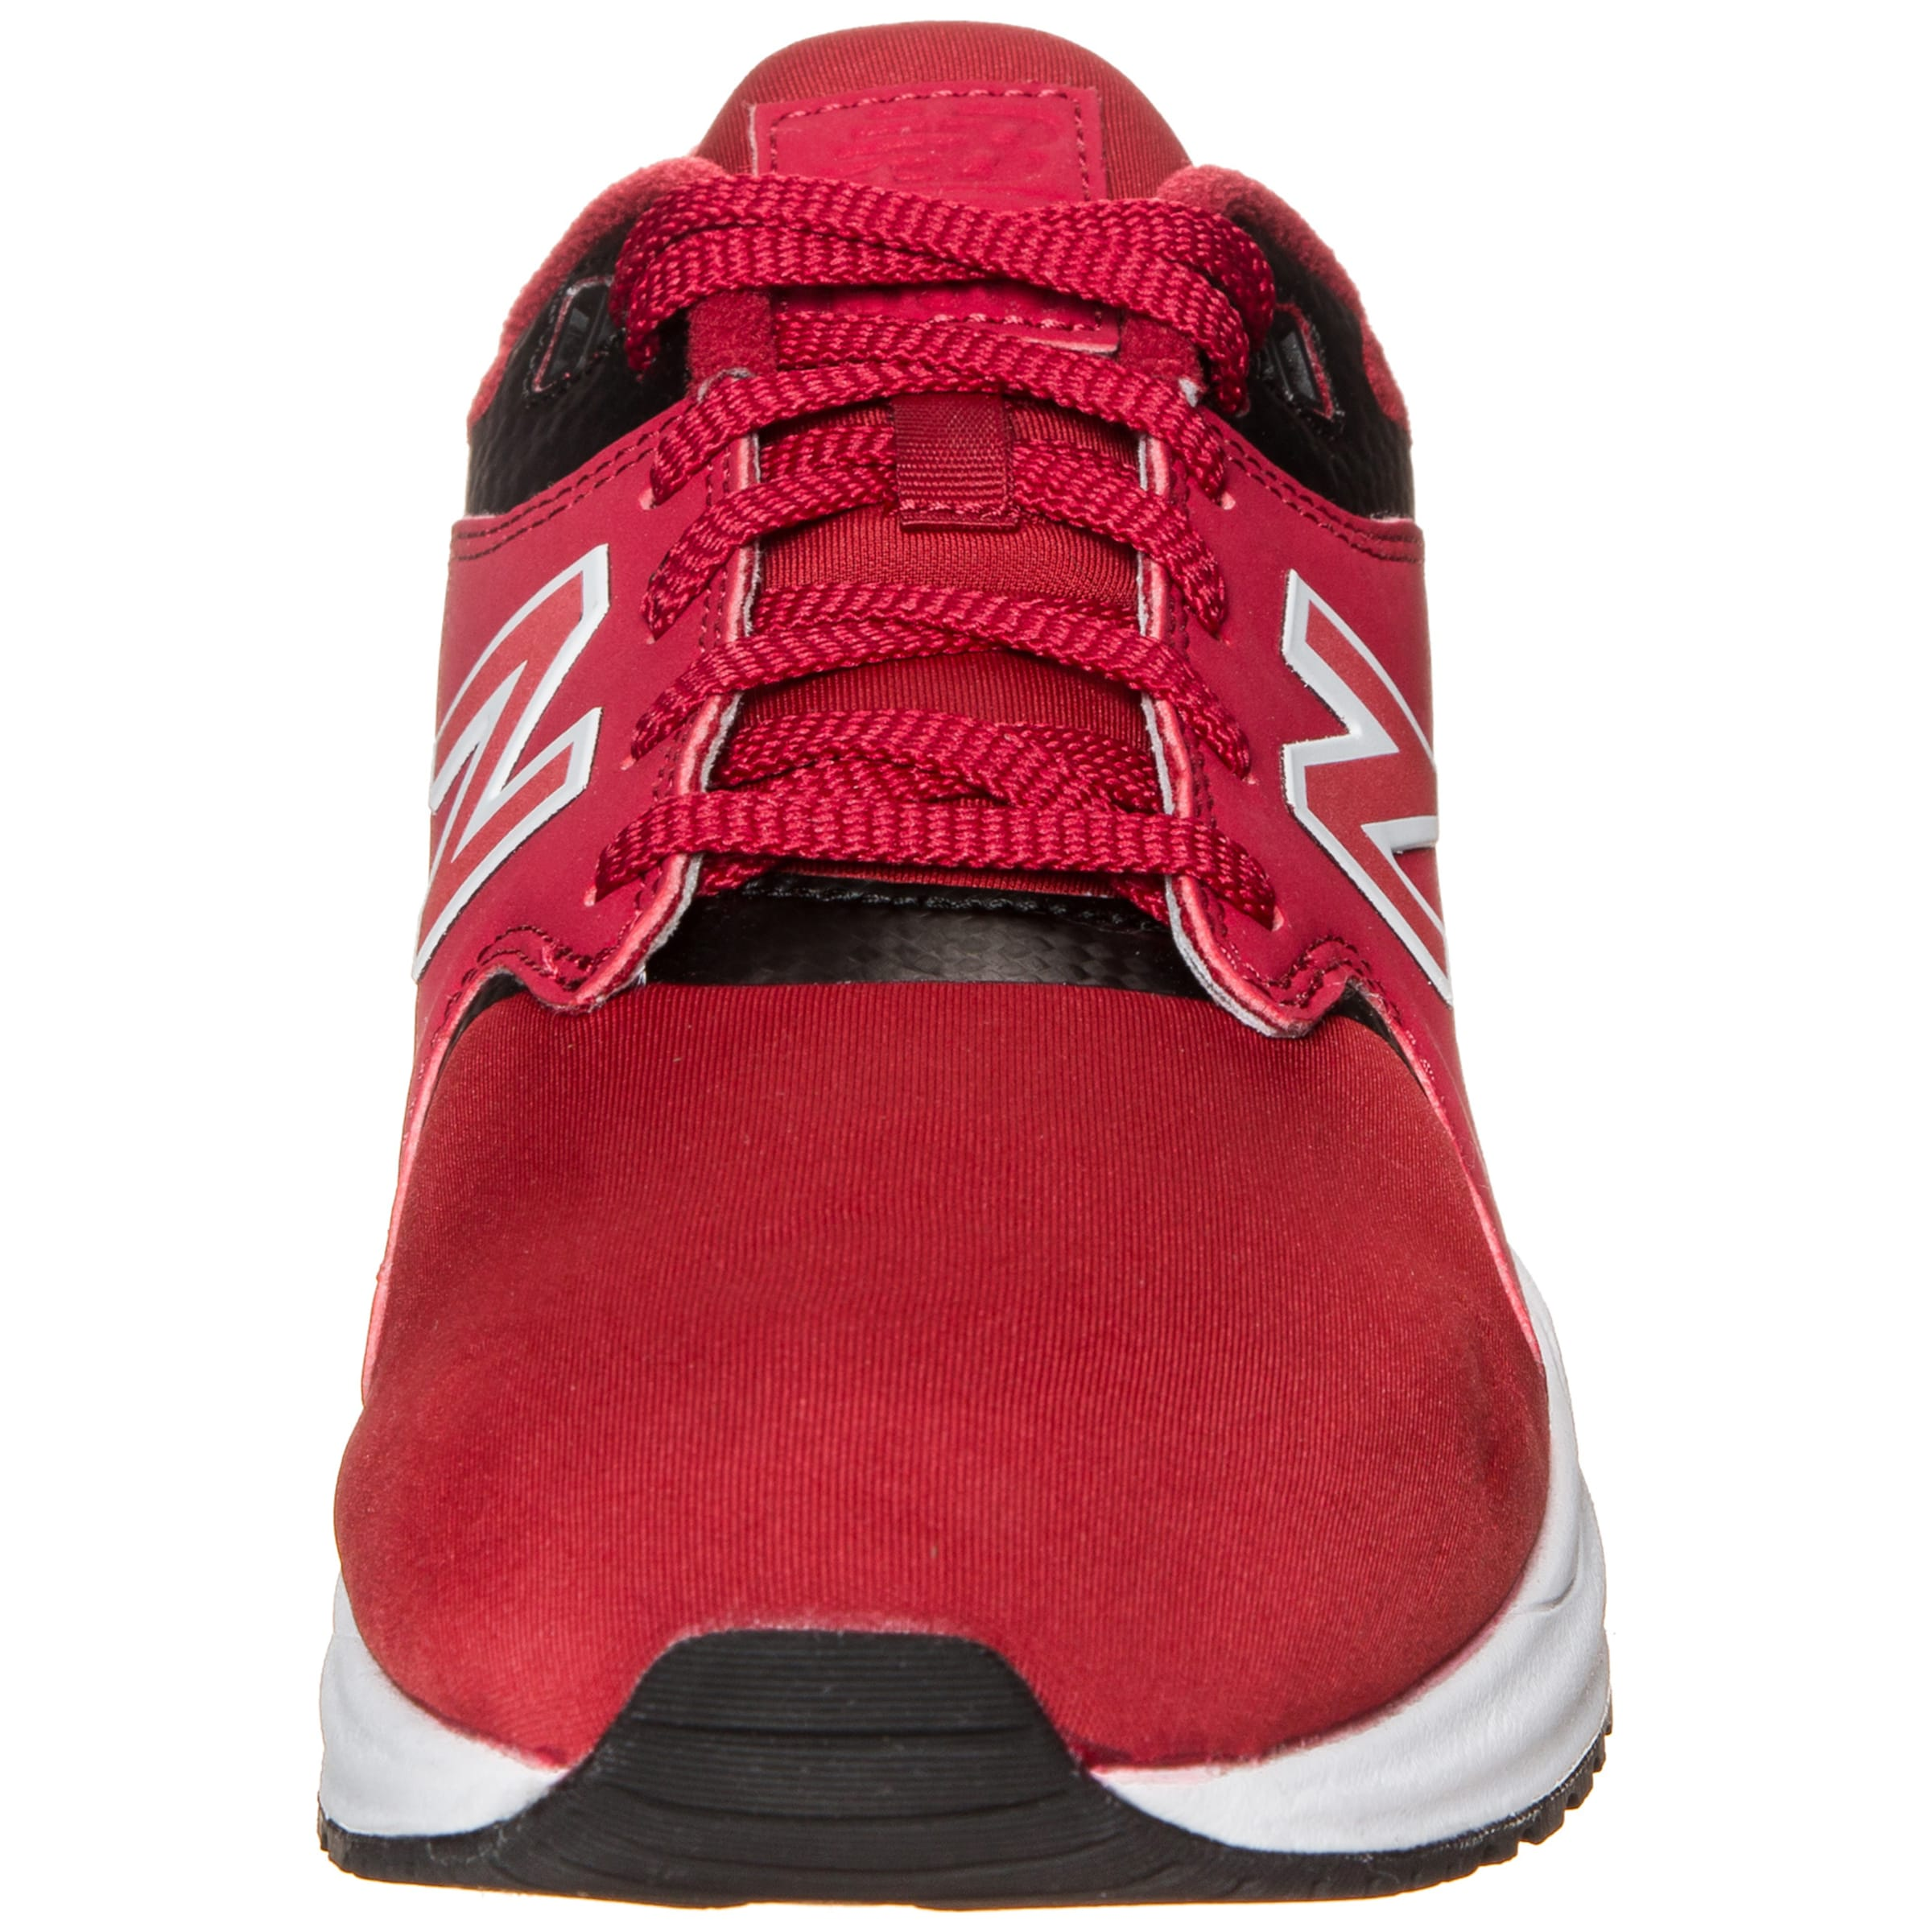 d' En Basses wr Balance Baskets 'ml1550 Rouge New Jc3KTlFu1